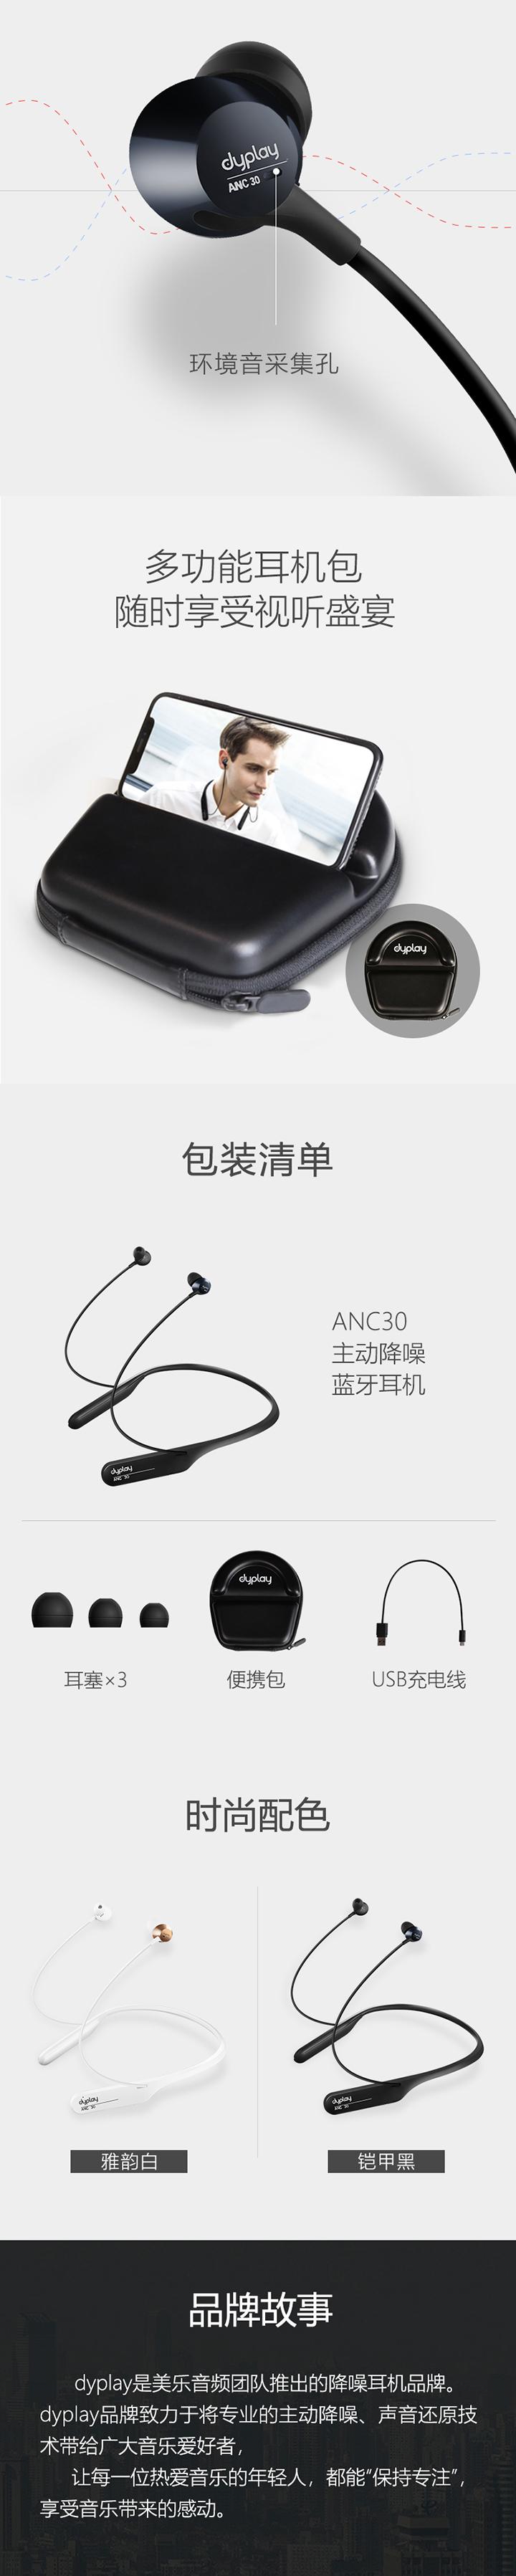 dyplay主动降噪蓝牙耳机组合免费试用,评测